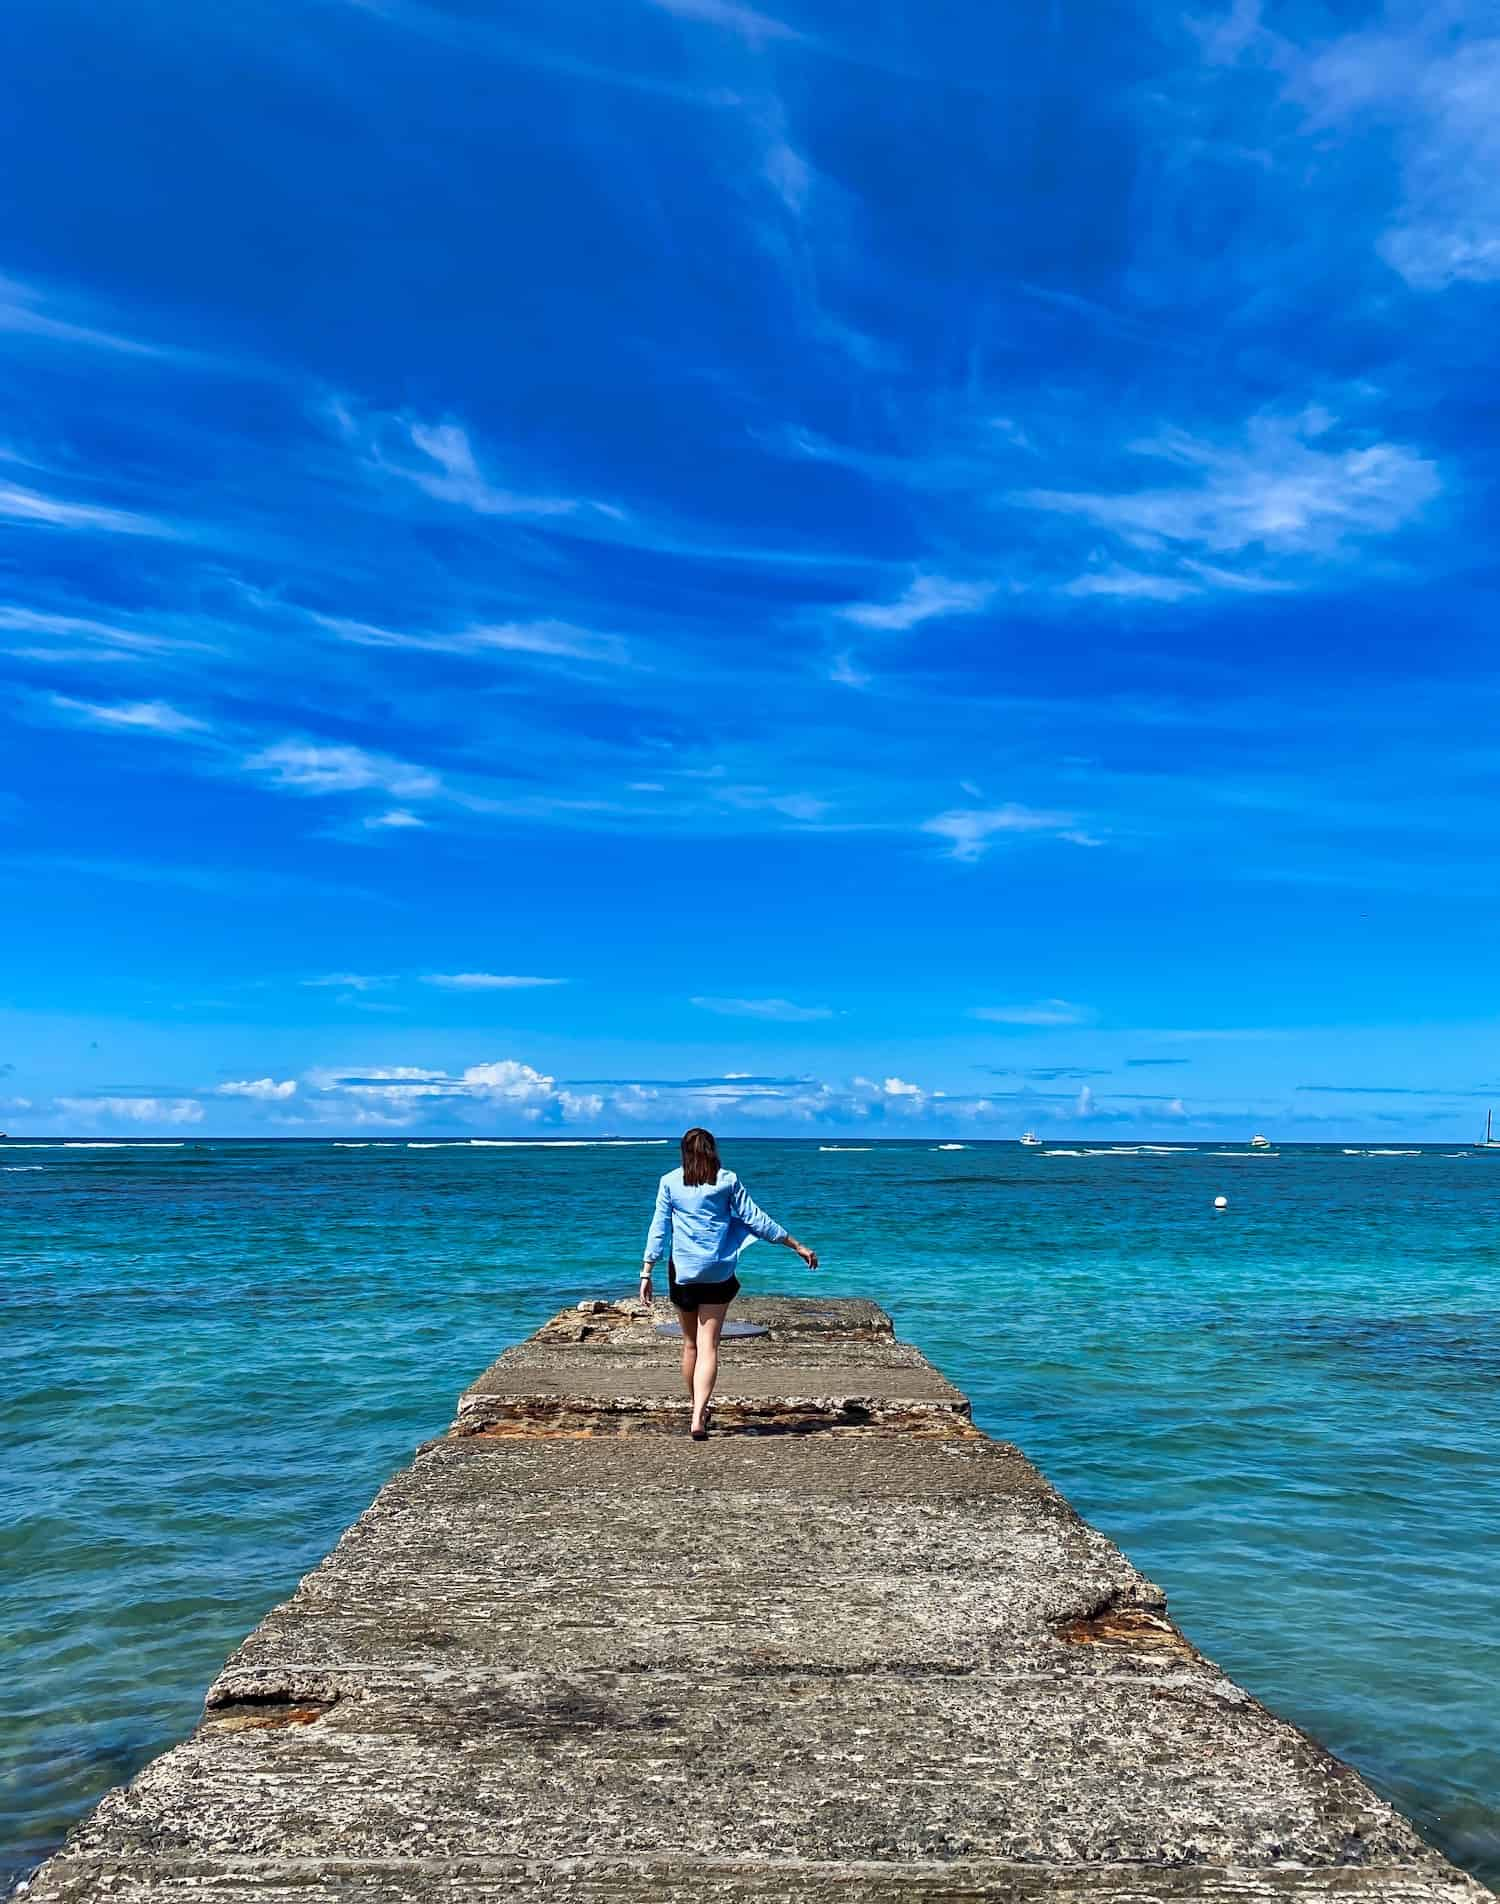 3 days on Oahu, Hawaii - Honolulu Pier